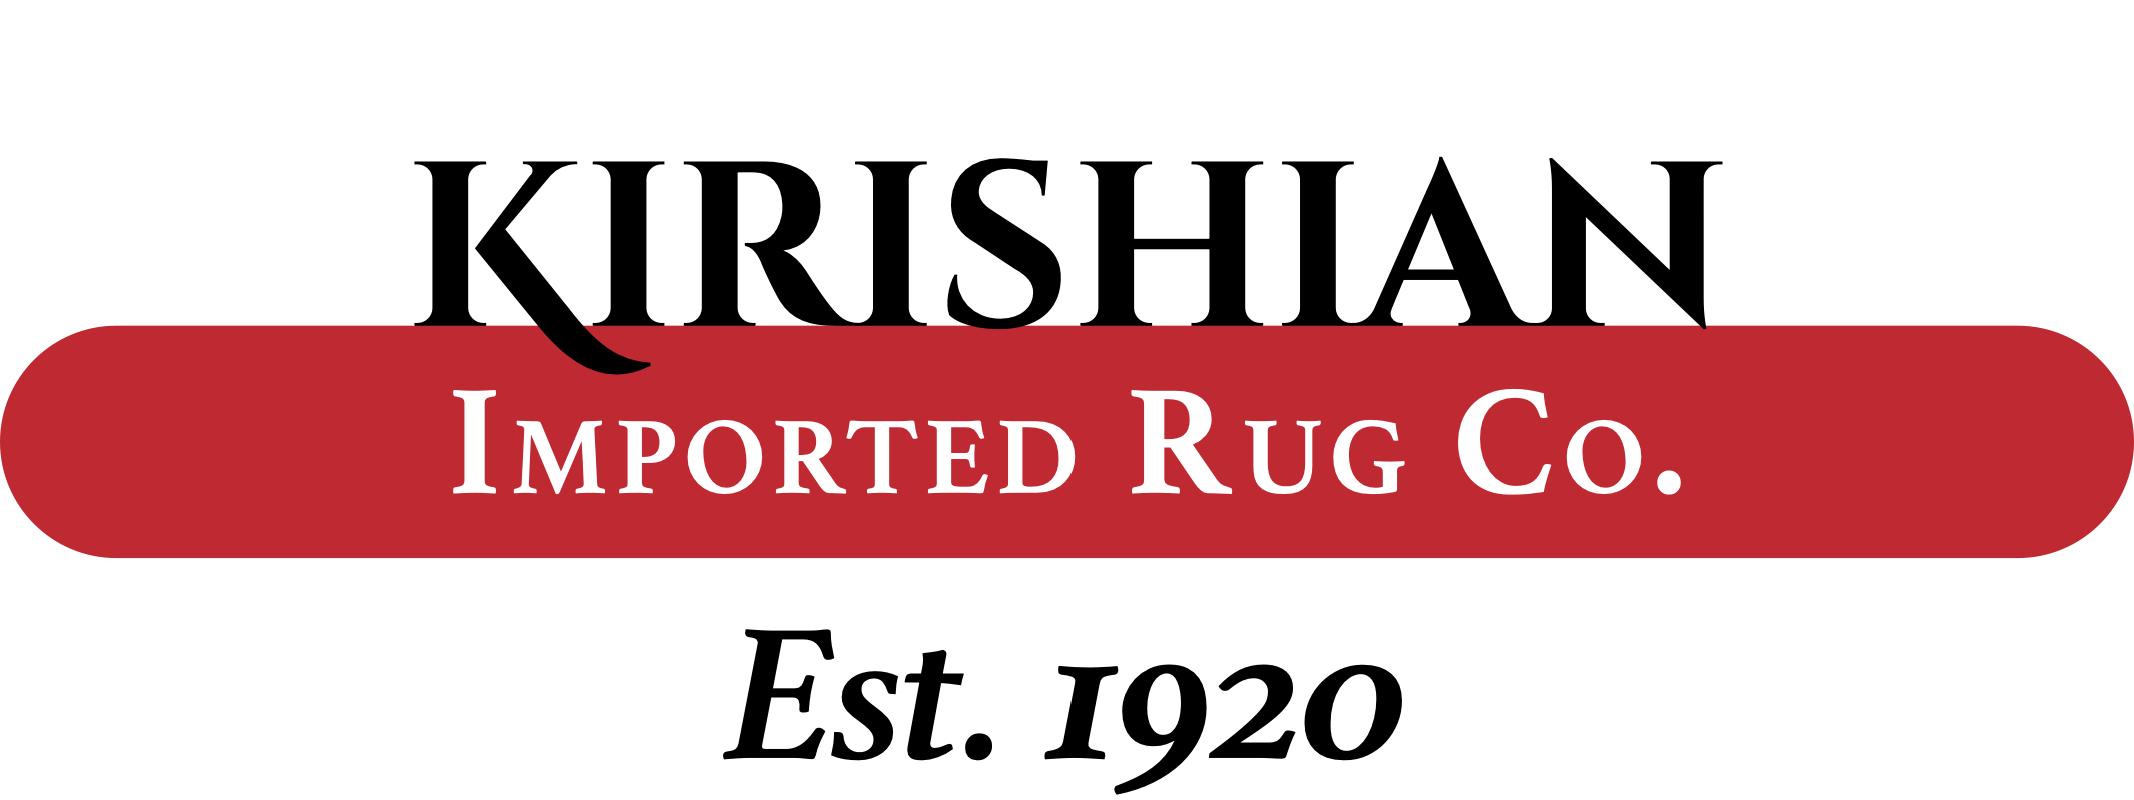 Kirishian Imported Rug Co.